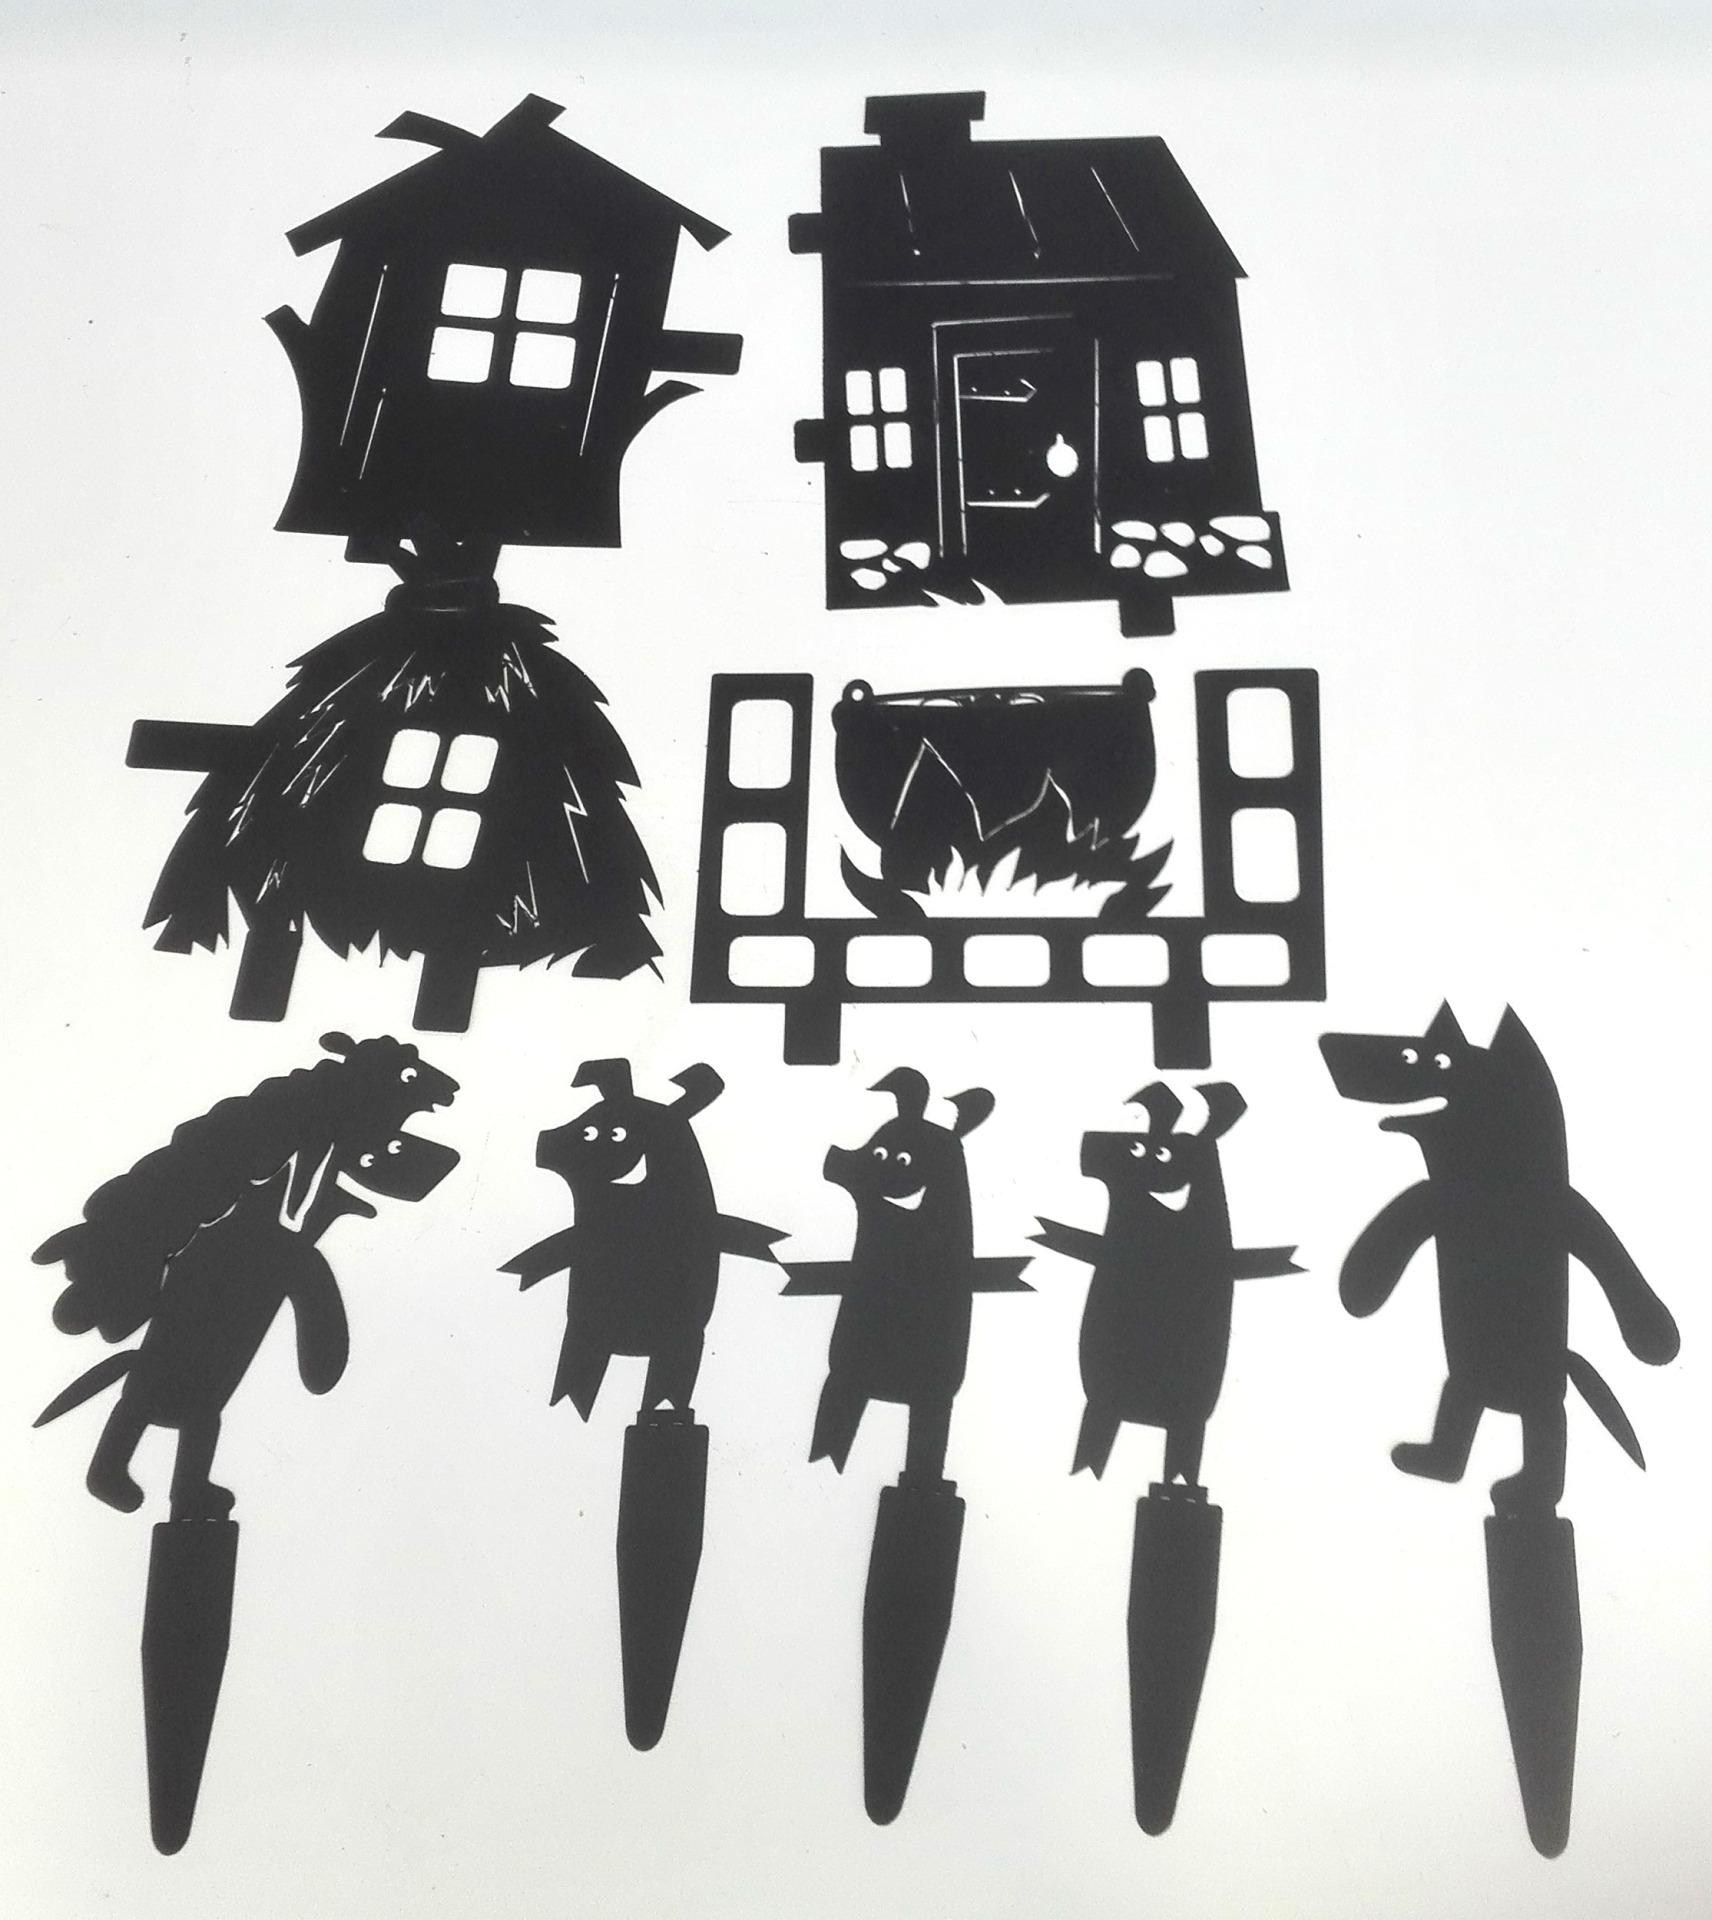 три поросенка - набор для театра теней